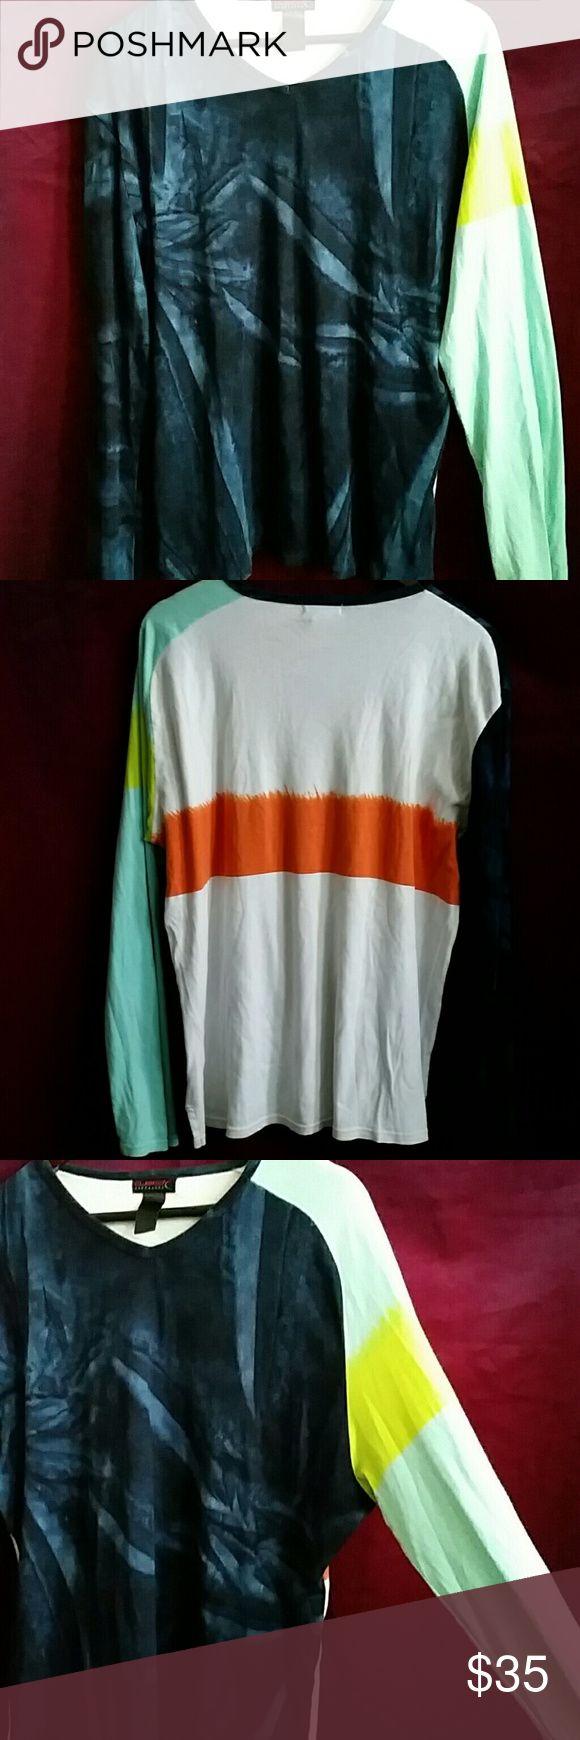 "CUSTO BARCELONA T-Shirt Size XL CUSTO BARCELONA  T-Shirt - Size XL - 28"" shoulder to hem - 49"" under around arms - 27"" sleeve Custo Barcelona Shirts"